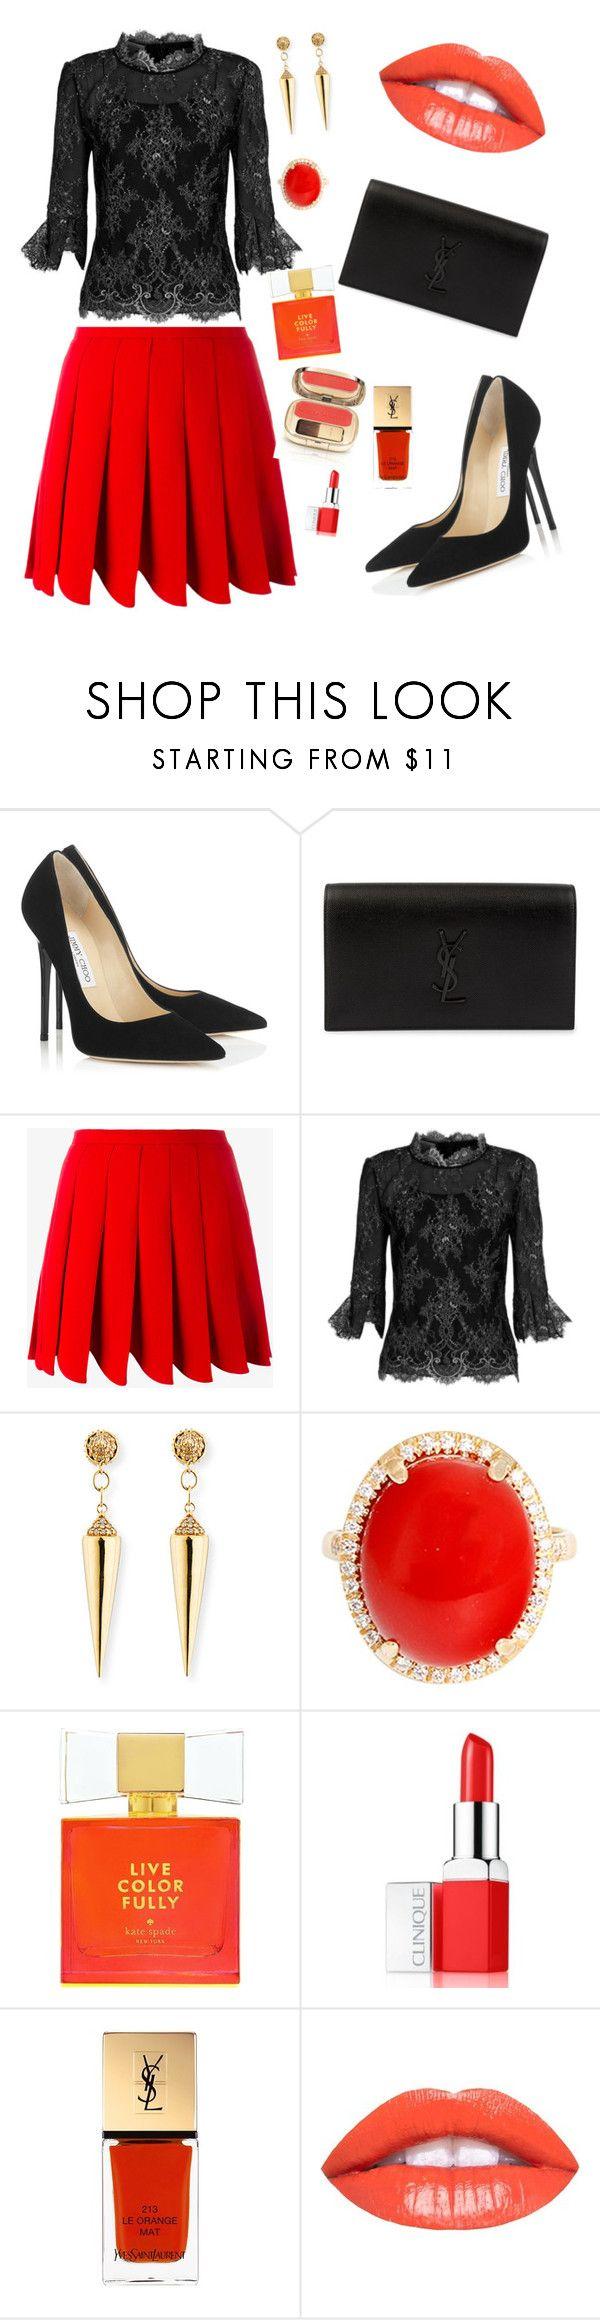 Orange & Black  outfit by Diva of Cake featuring mode, Oscar de la Renta, Miu Miu, Jimmy Choo, Yves Saint Laurent, Sydney Evan, Clinique, Kate Spade and Dolce&Gabbana